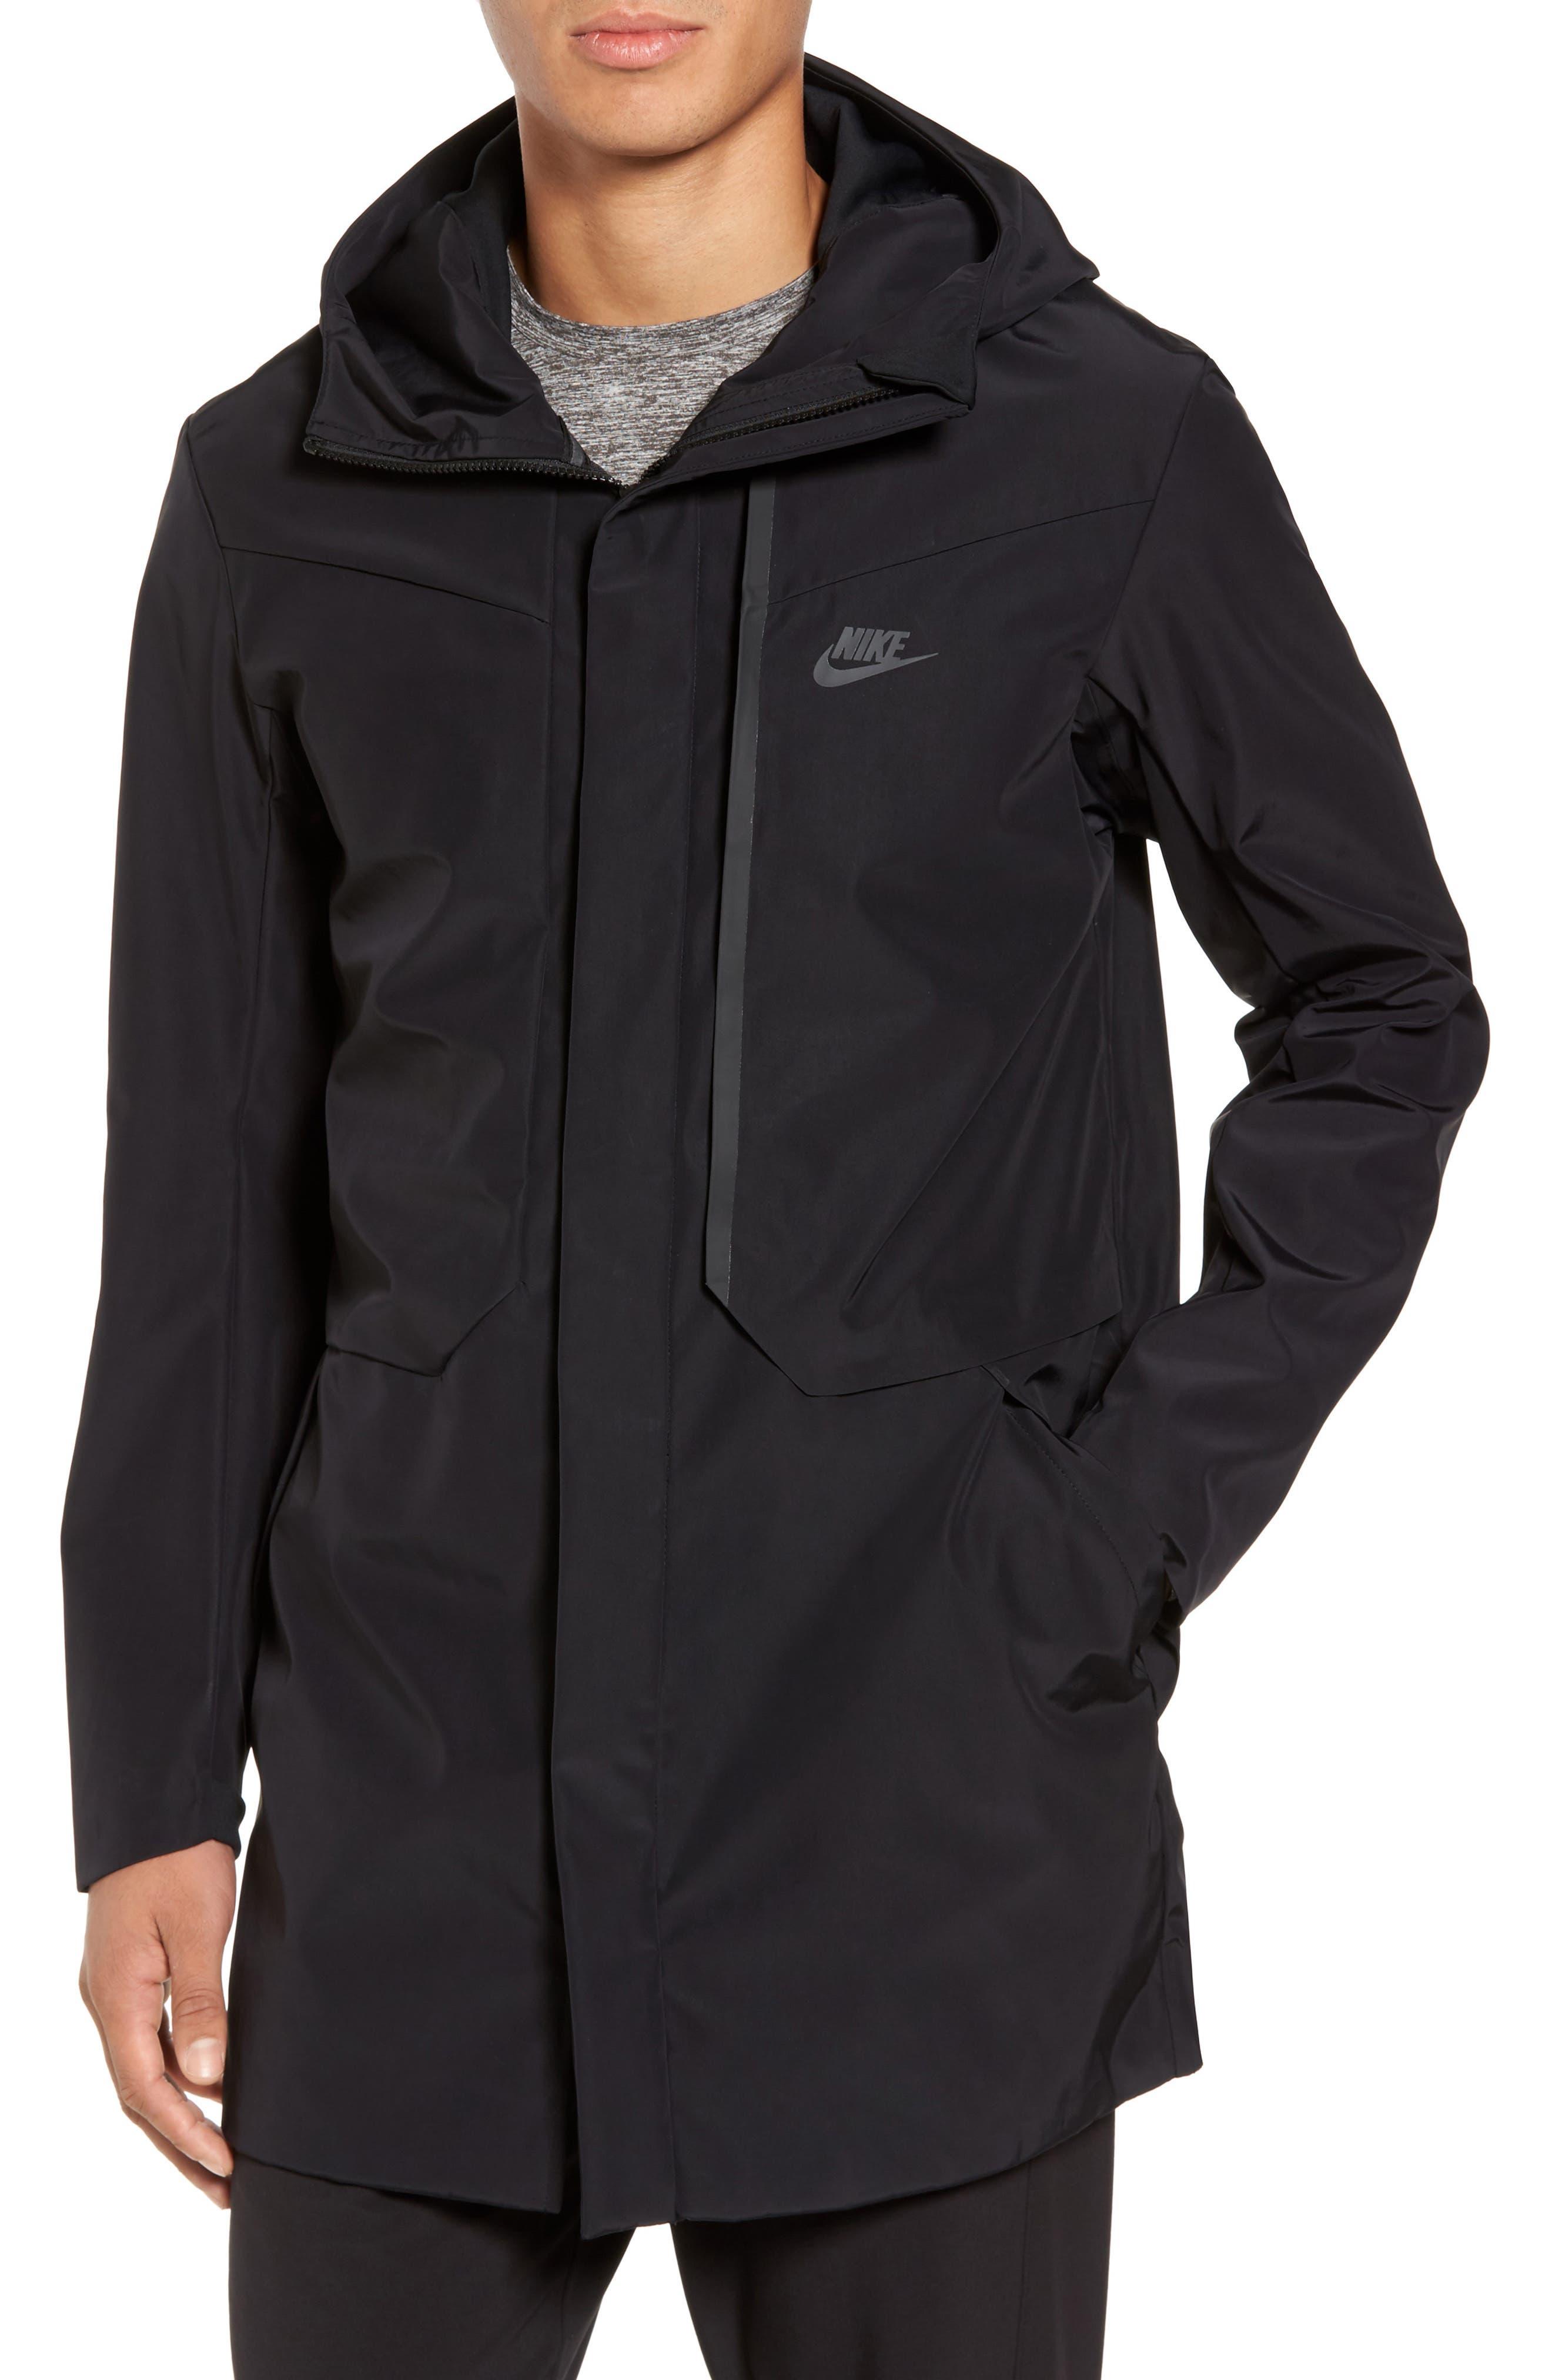 Main Image - Nike NSW Tech Track Jacket